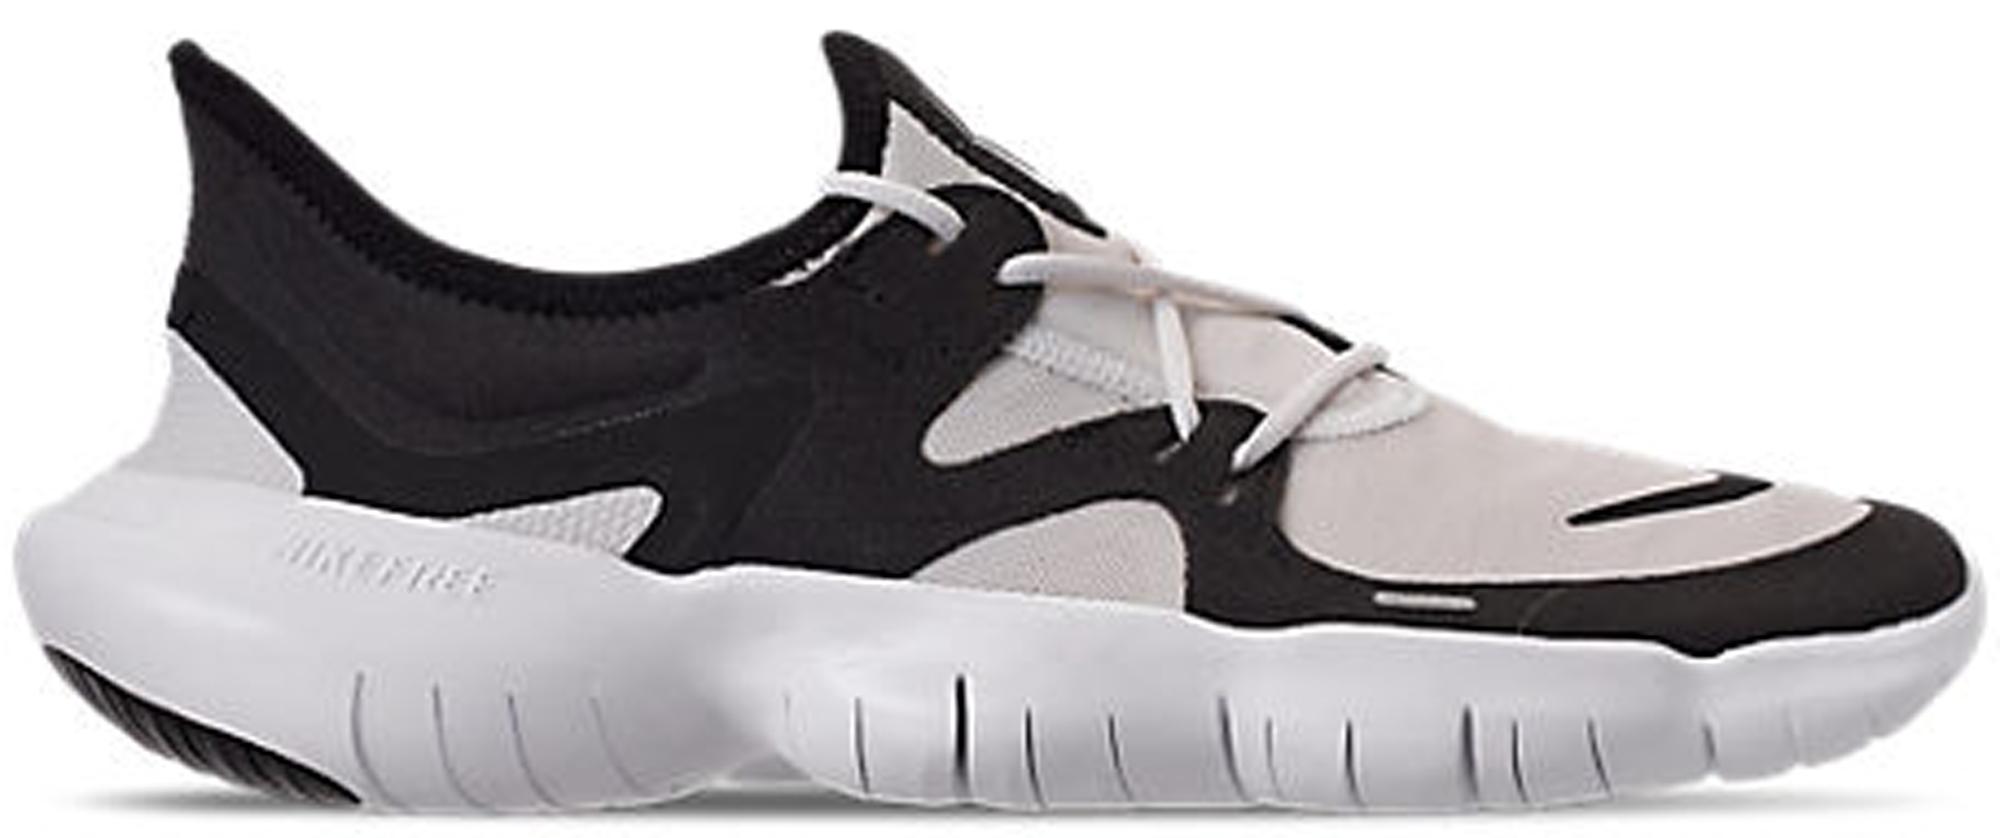 Nike Free RN 5.0 White Black - AQ1289-102